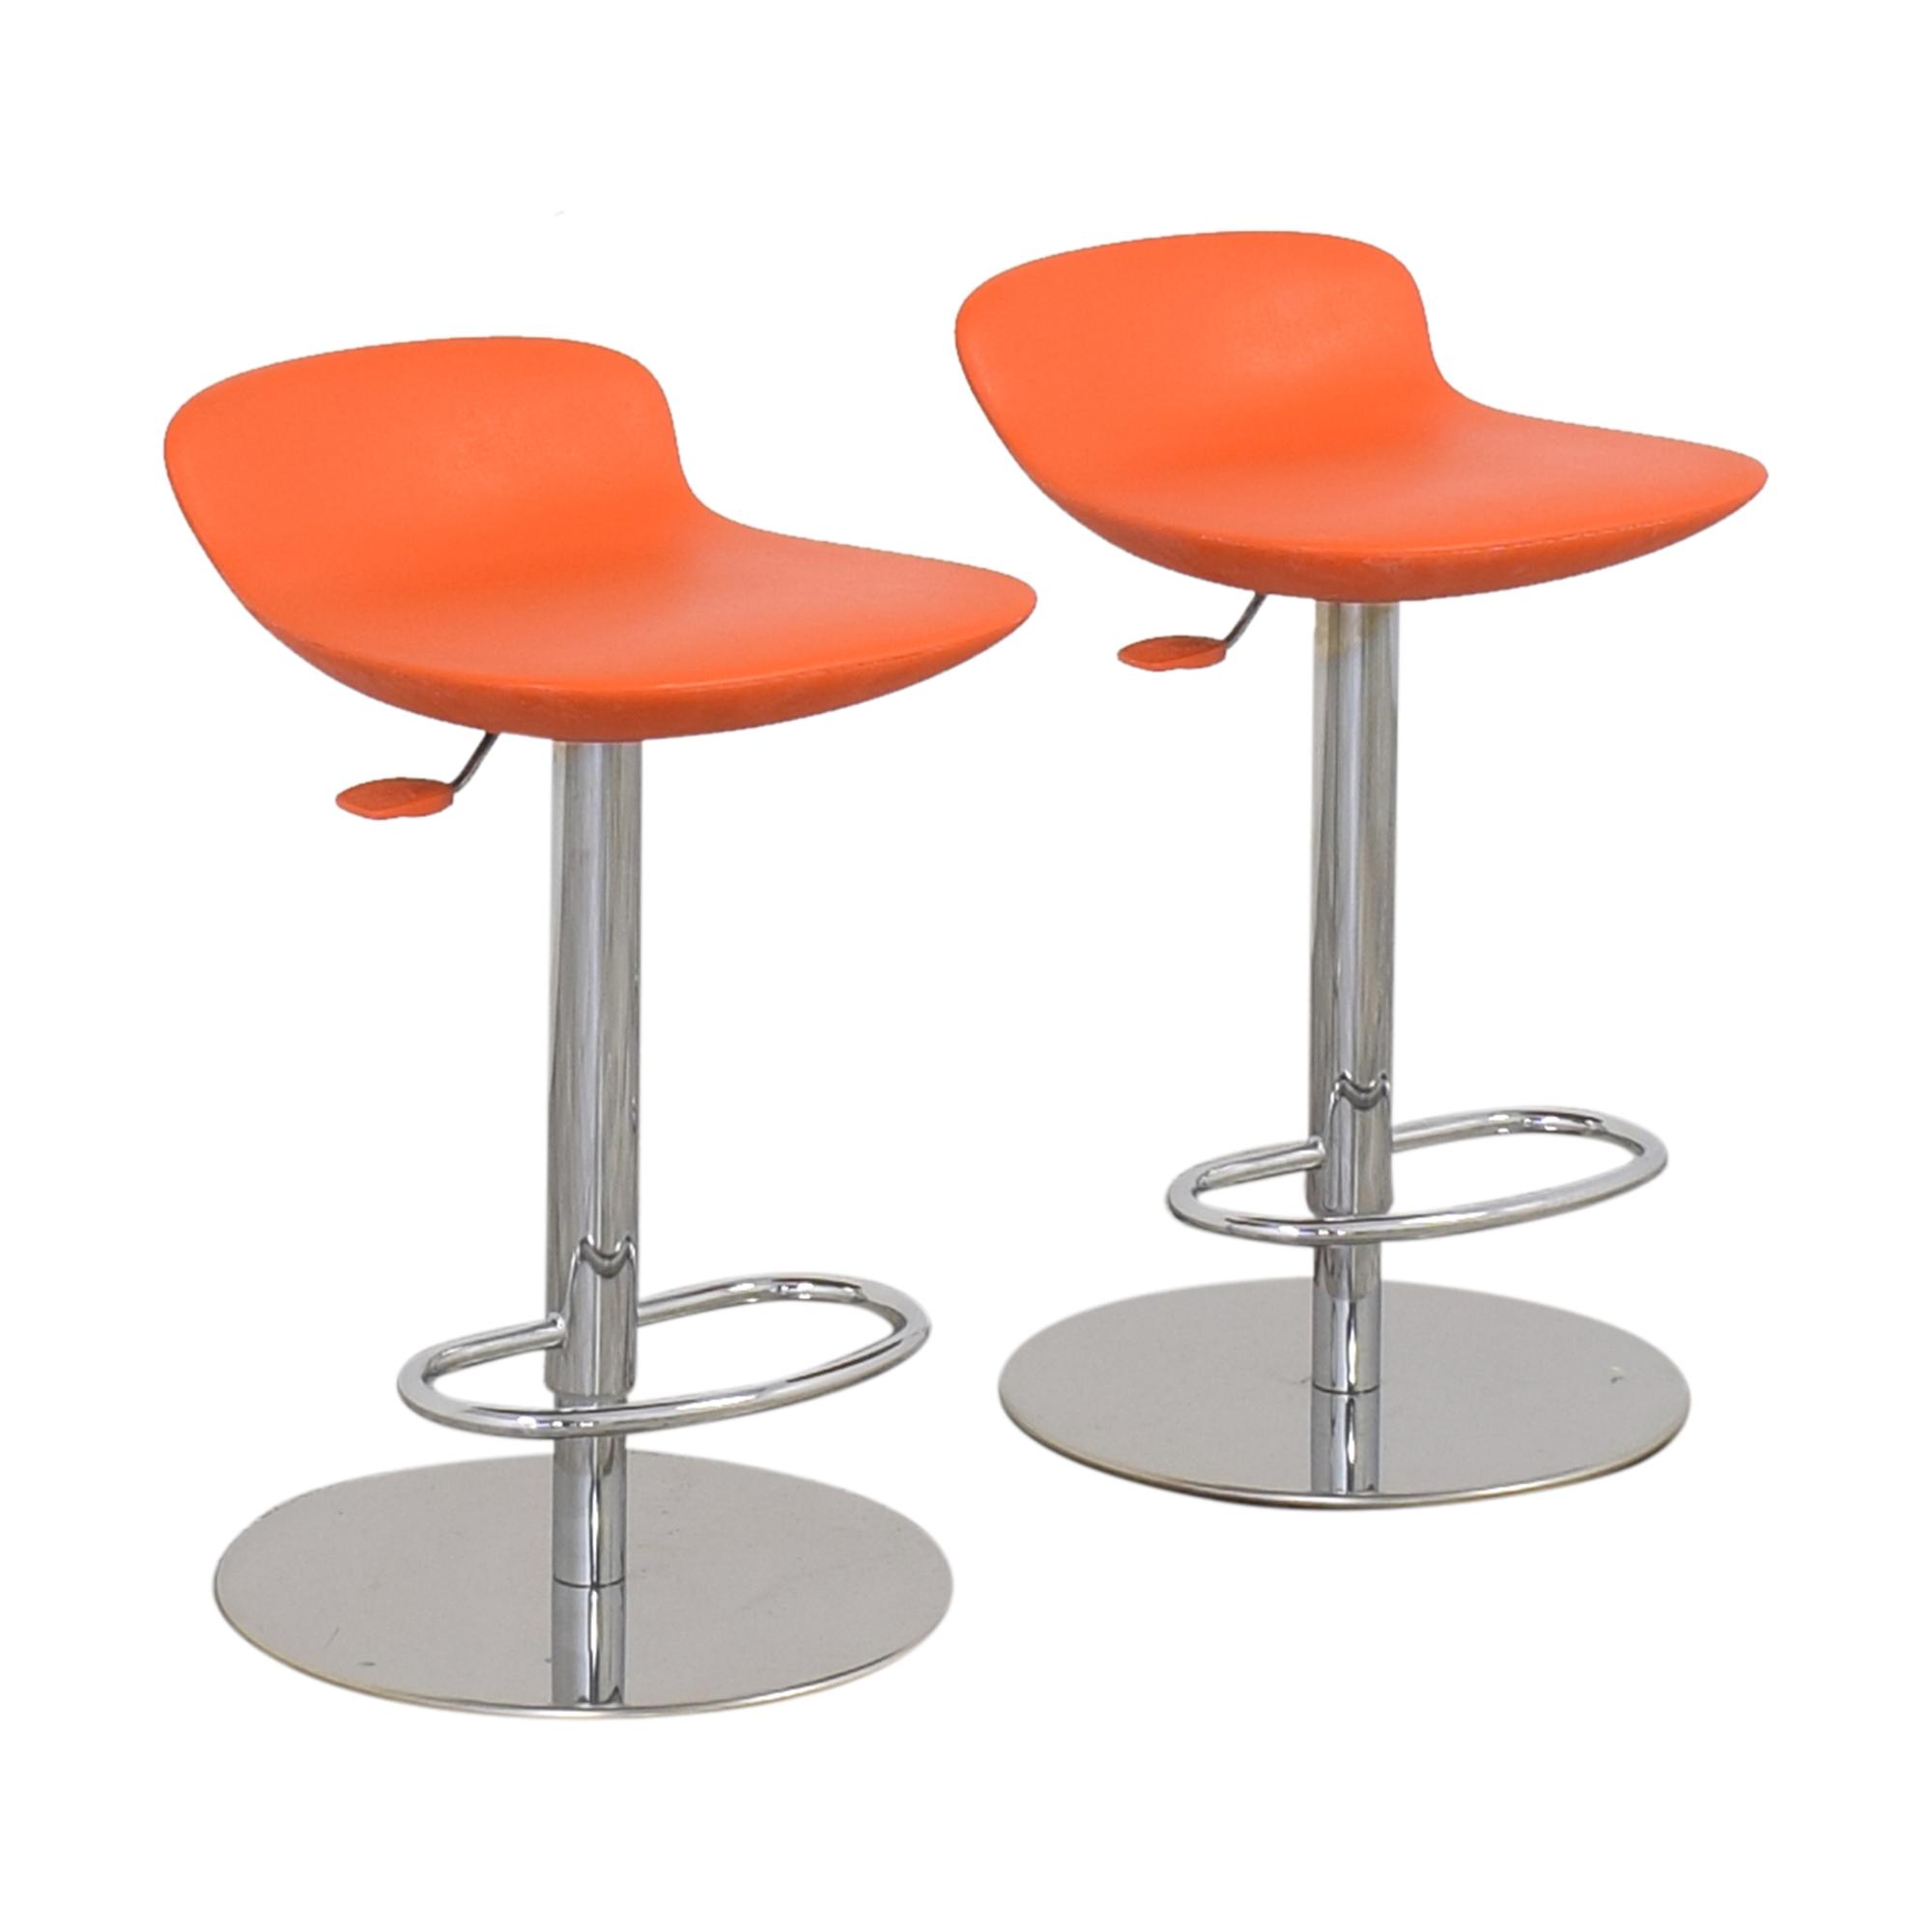 Room & Board Room & Board Leo Swivel Stools Chairs